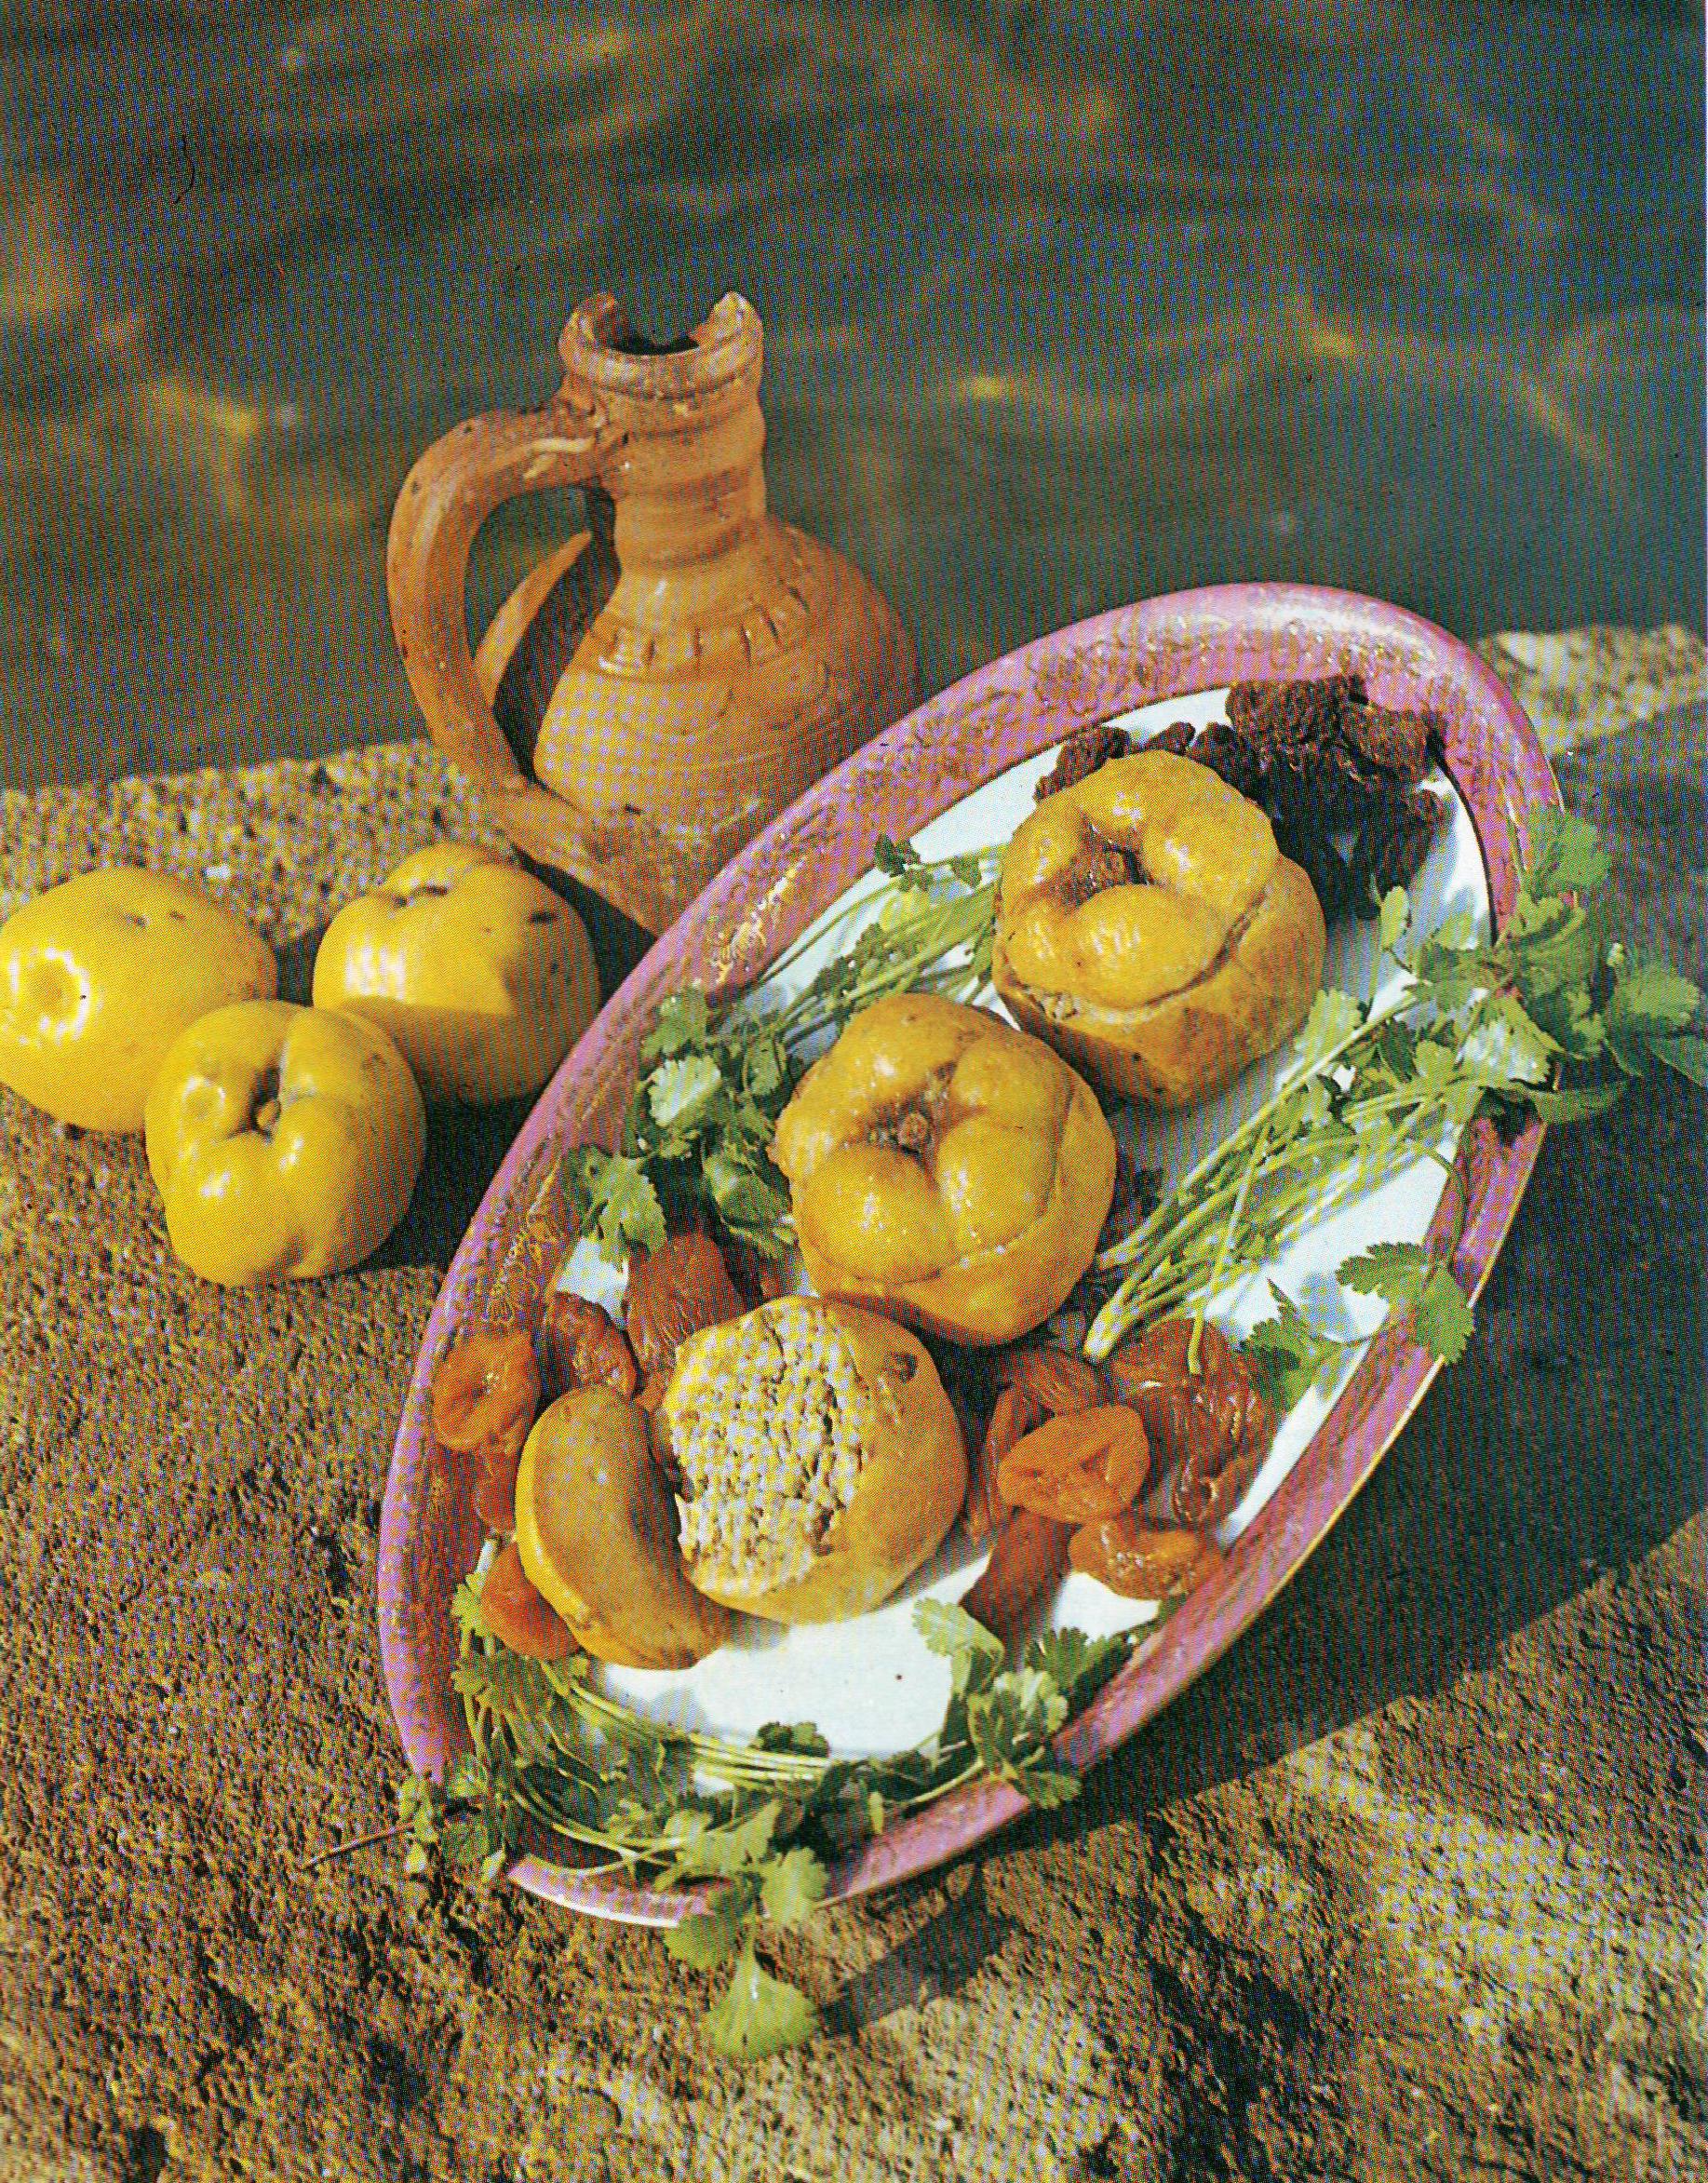 File:Heyva dolması Azerbaijani cuisine.jpg - Wikimedia Commons